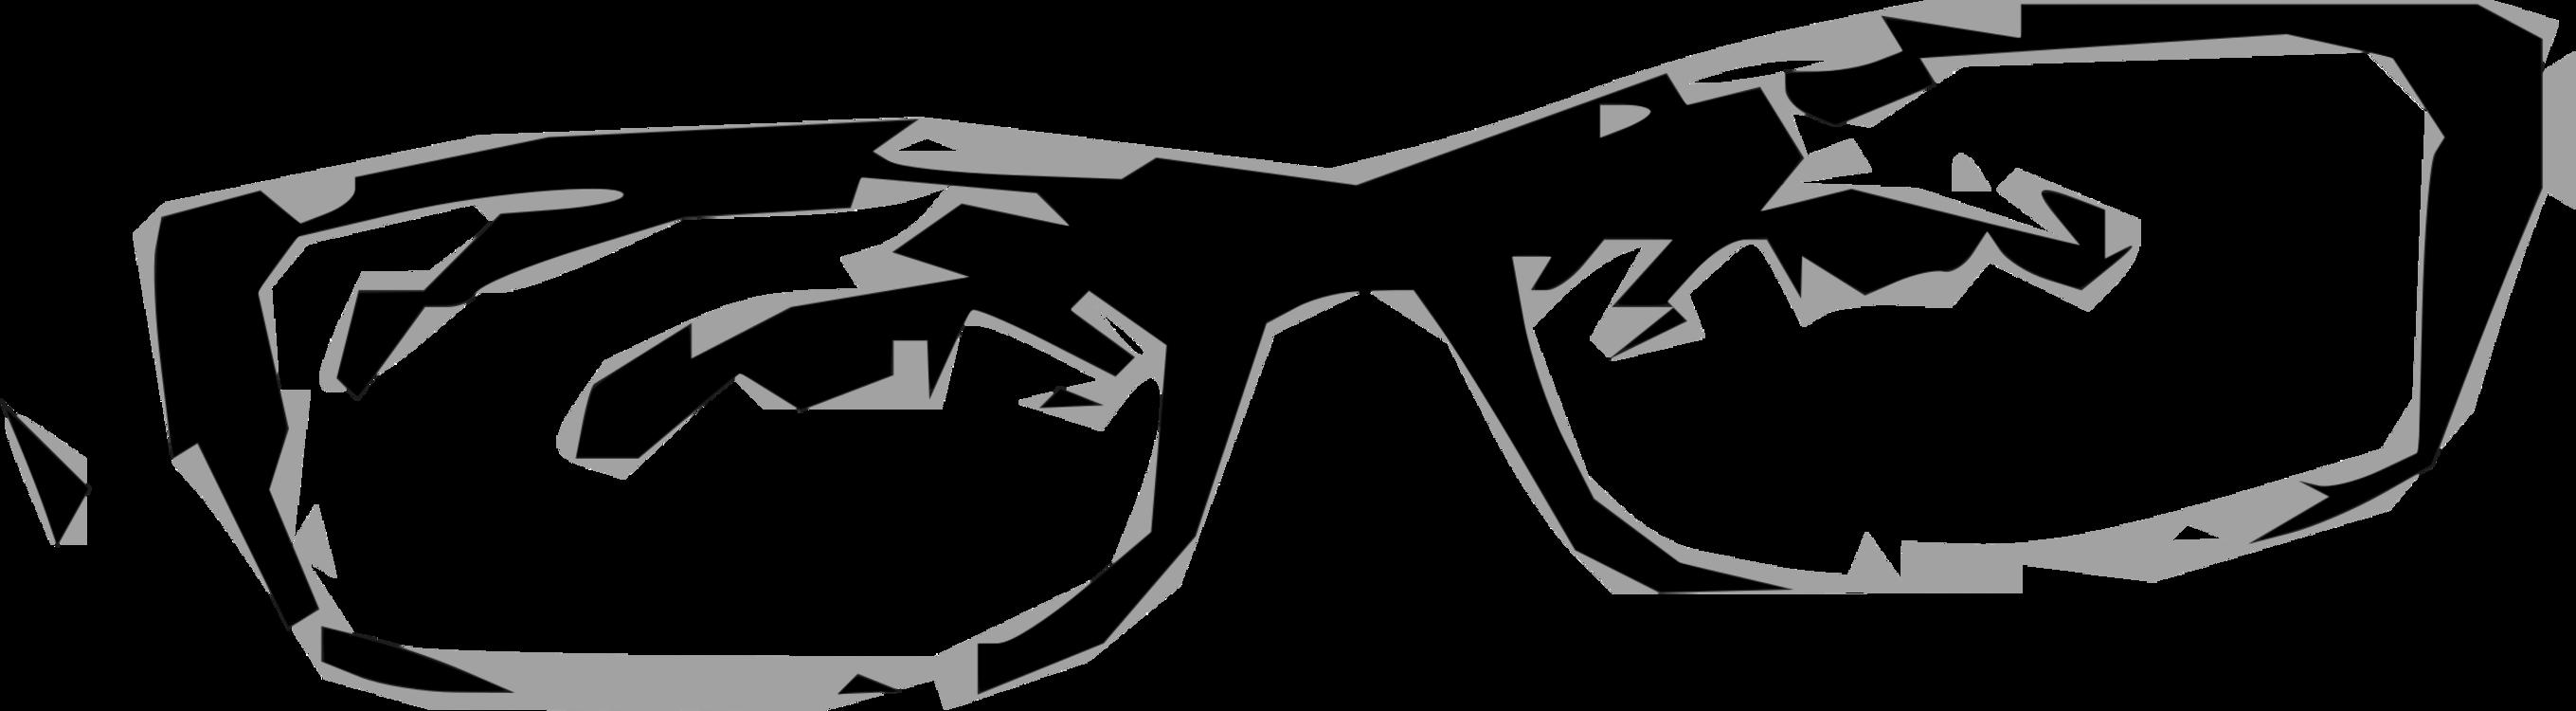 Rhinestone Cat's Eye Glasses - 50s Costumes - Candy Apple Costumes